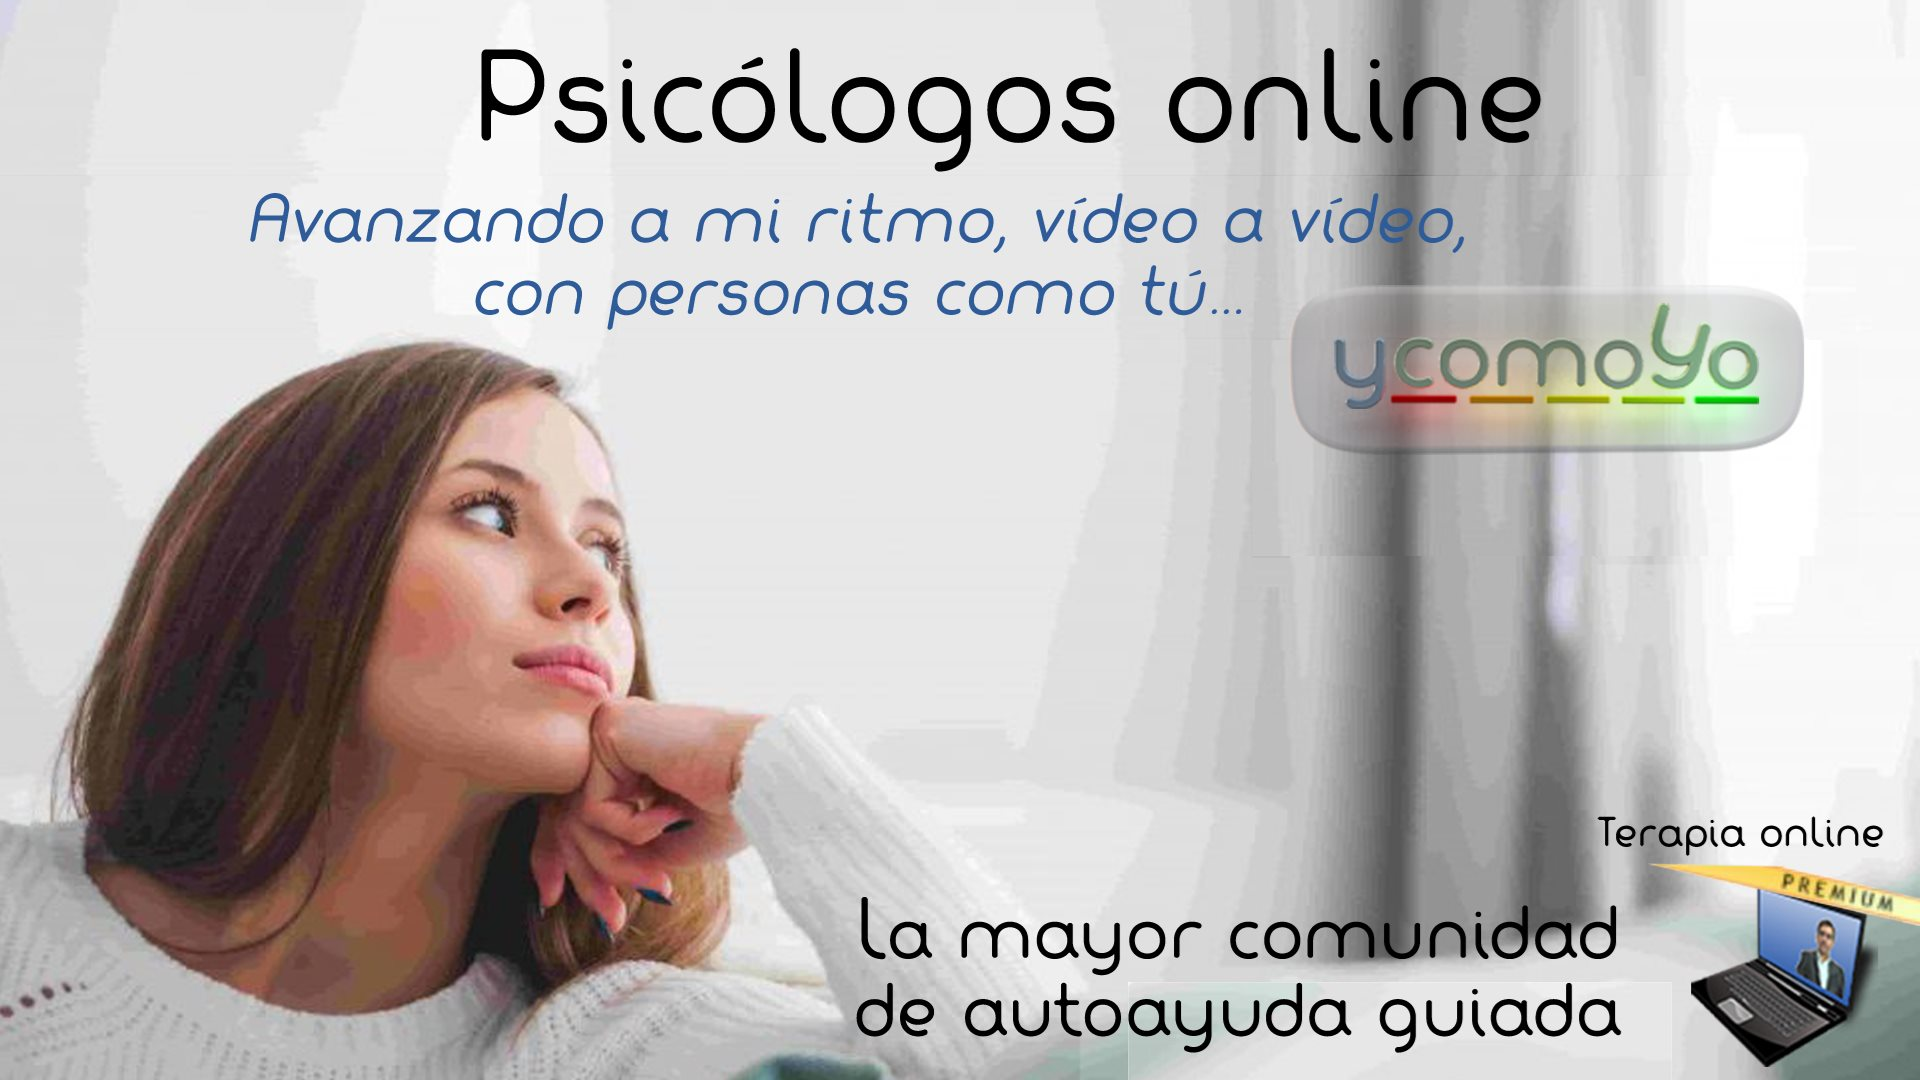 Autoayuda online